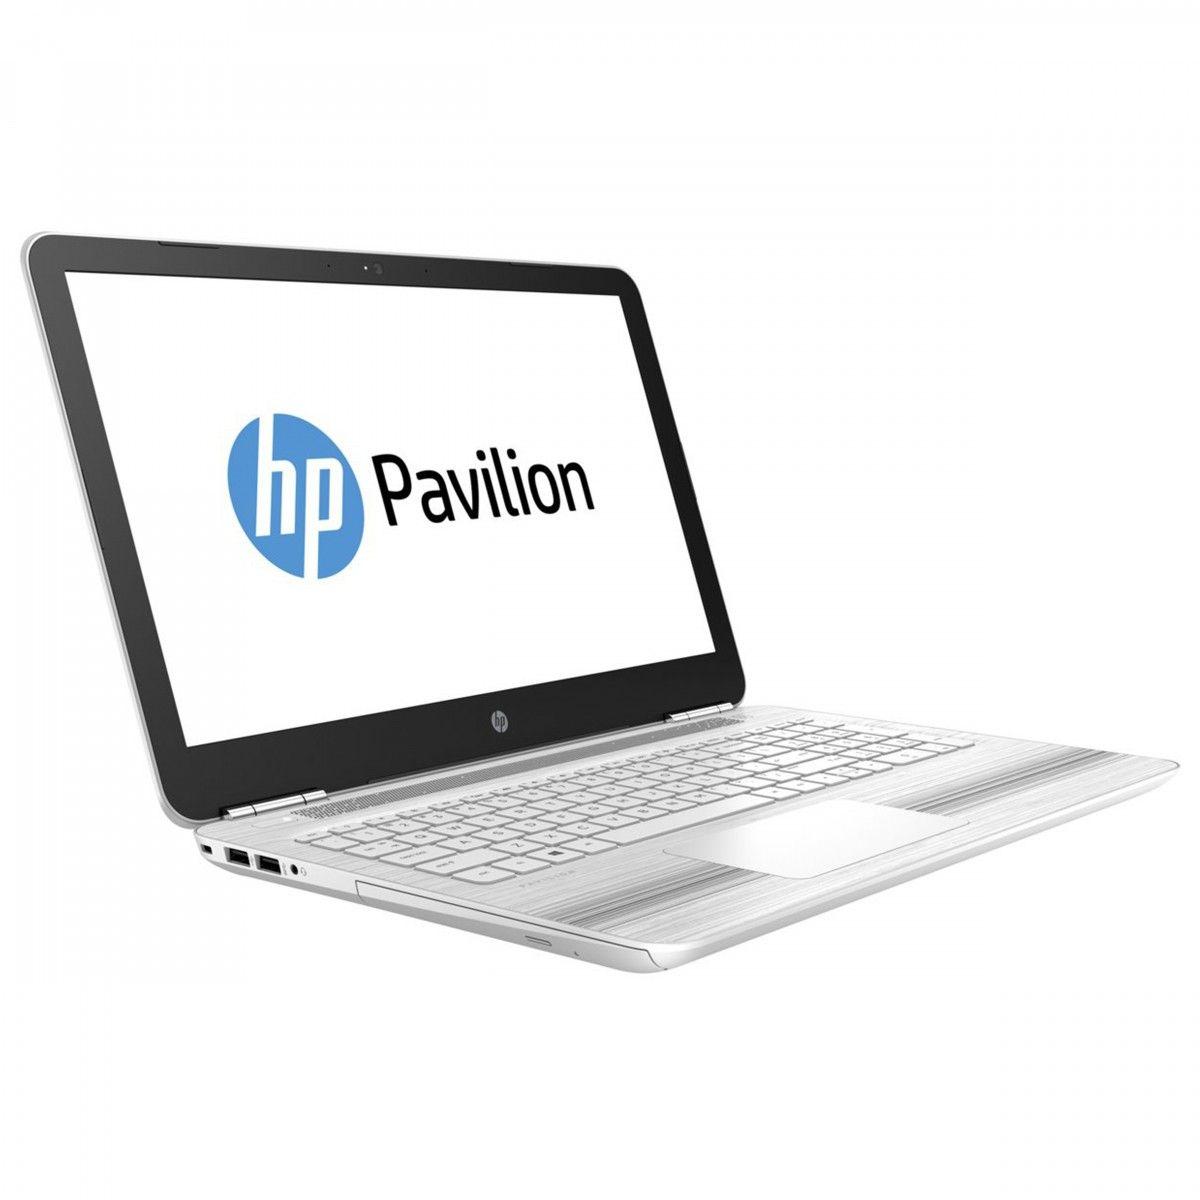 HP Pavilion NoteBook PC 15-au171sa (Core-i3 7th Gen, 8GB DDR4 RAM